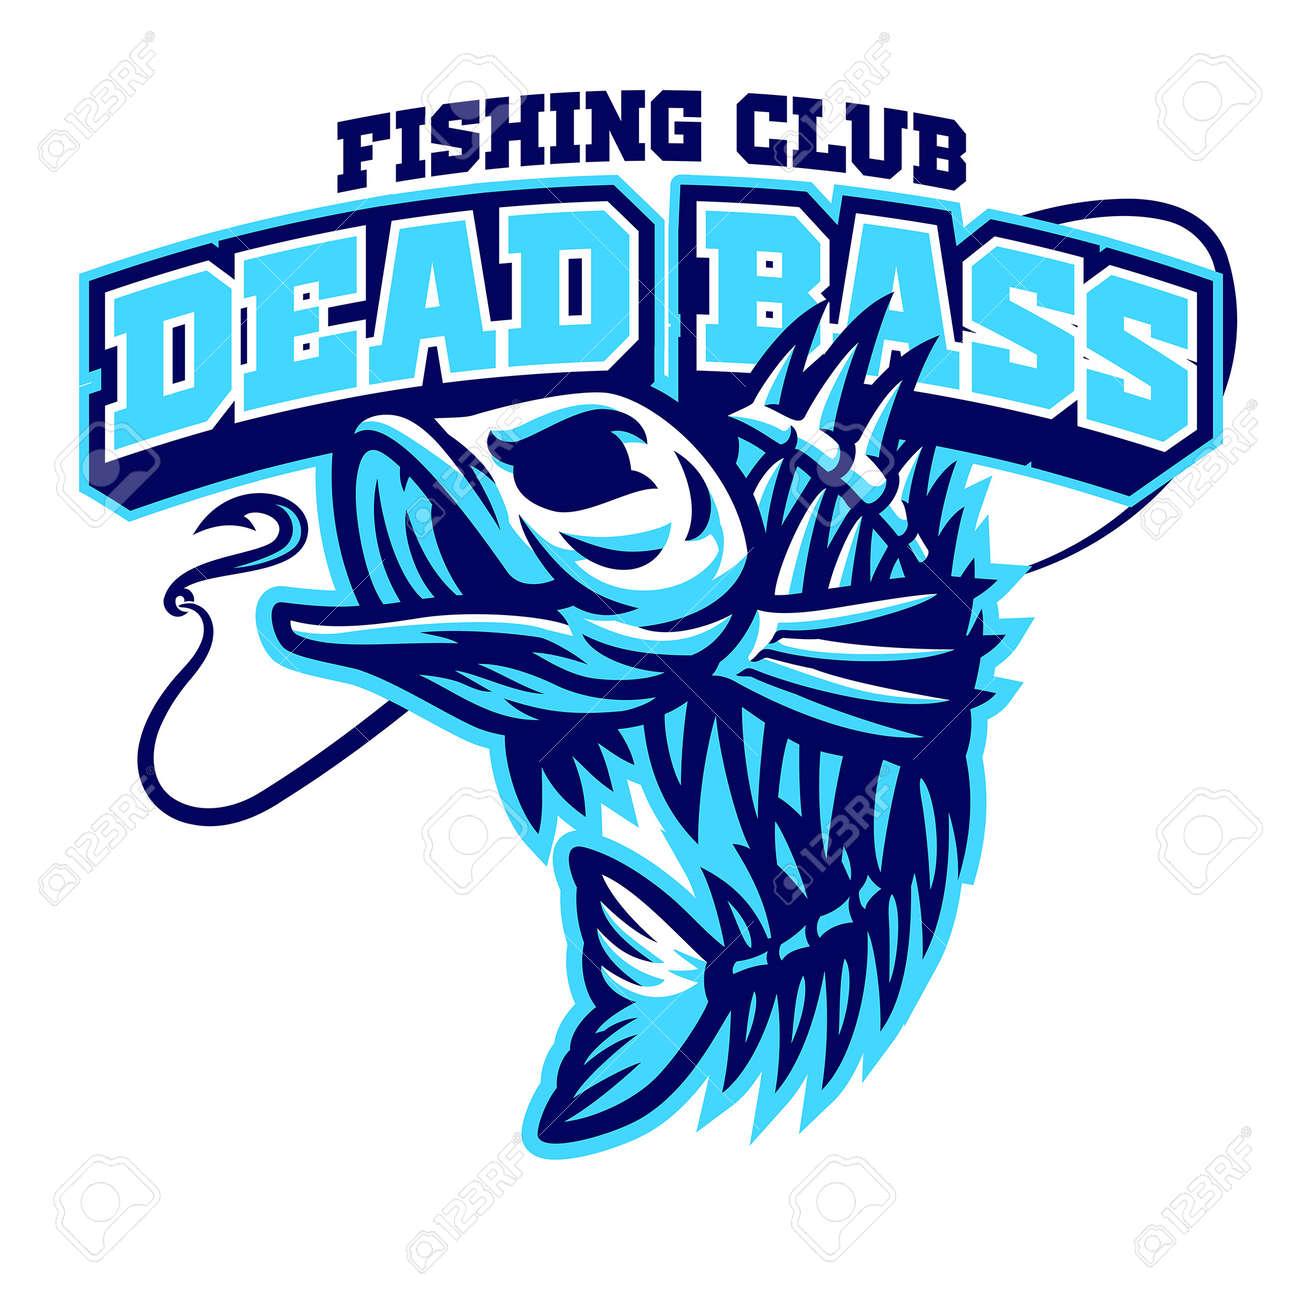 Largemouth bass fish skull mascot - 169099665